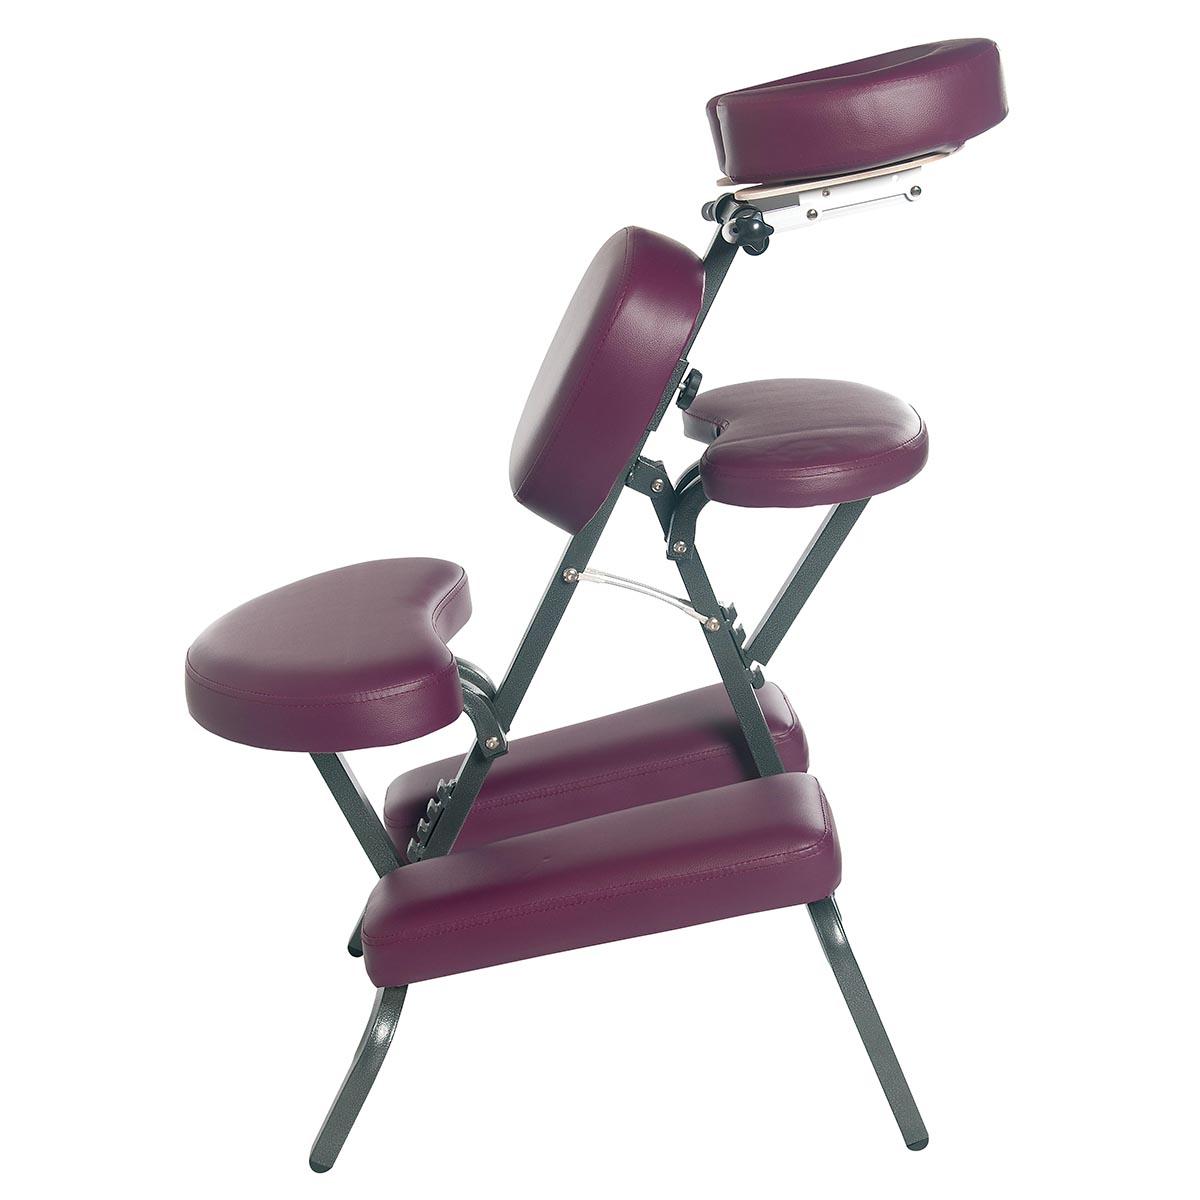 Pro Massage Chair Massage Furniture Portable Massage Chair